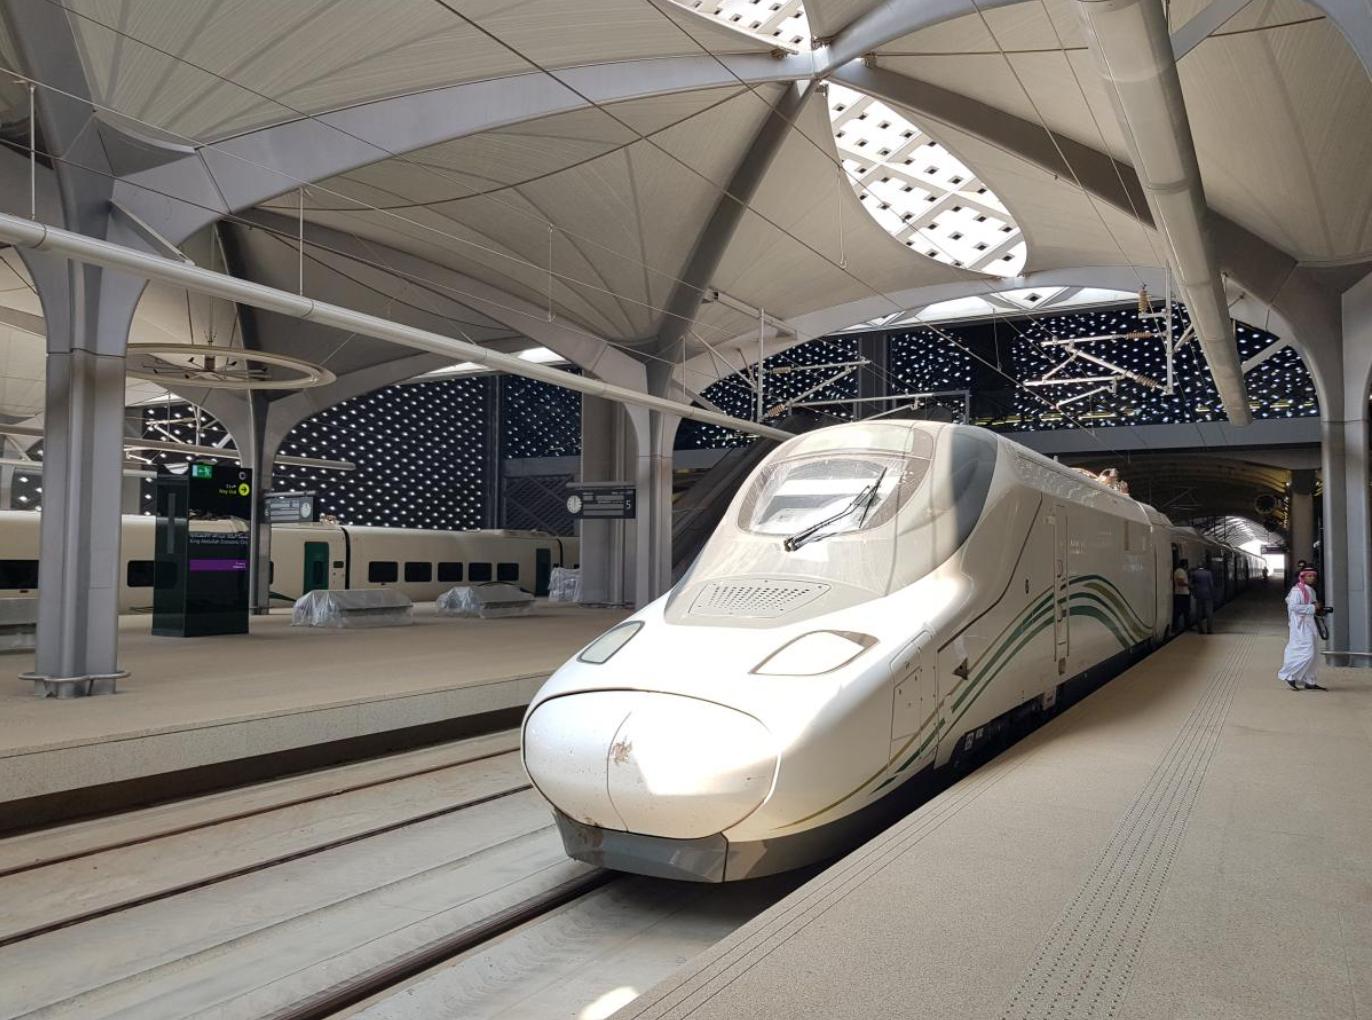 Saudi Arabia opens high-speed train linking Islam's holiest cities